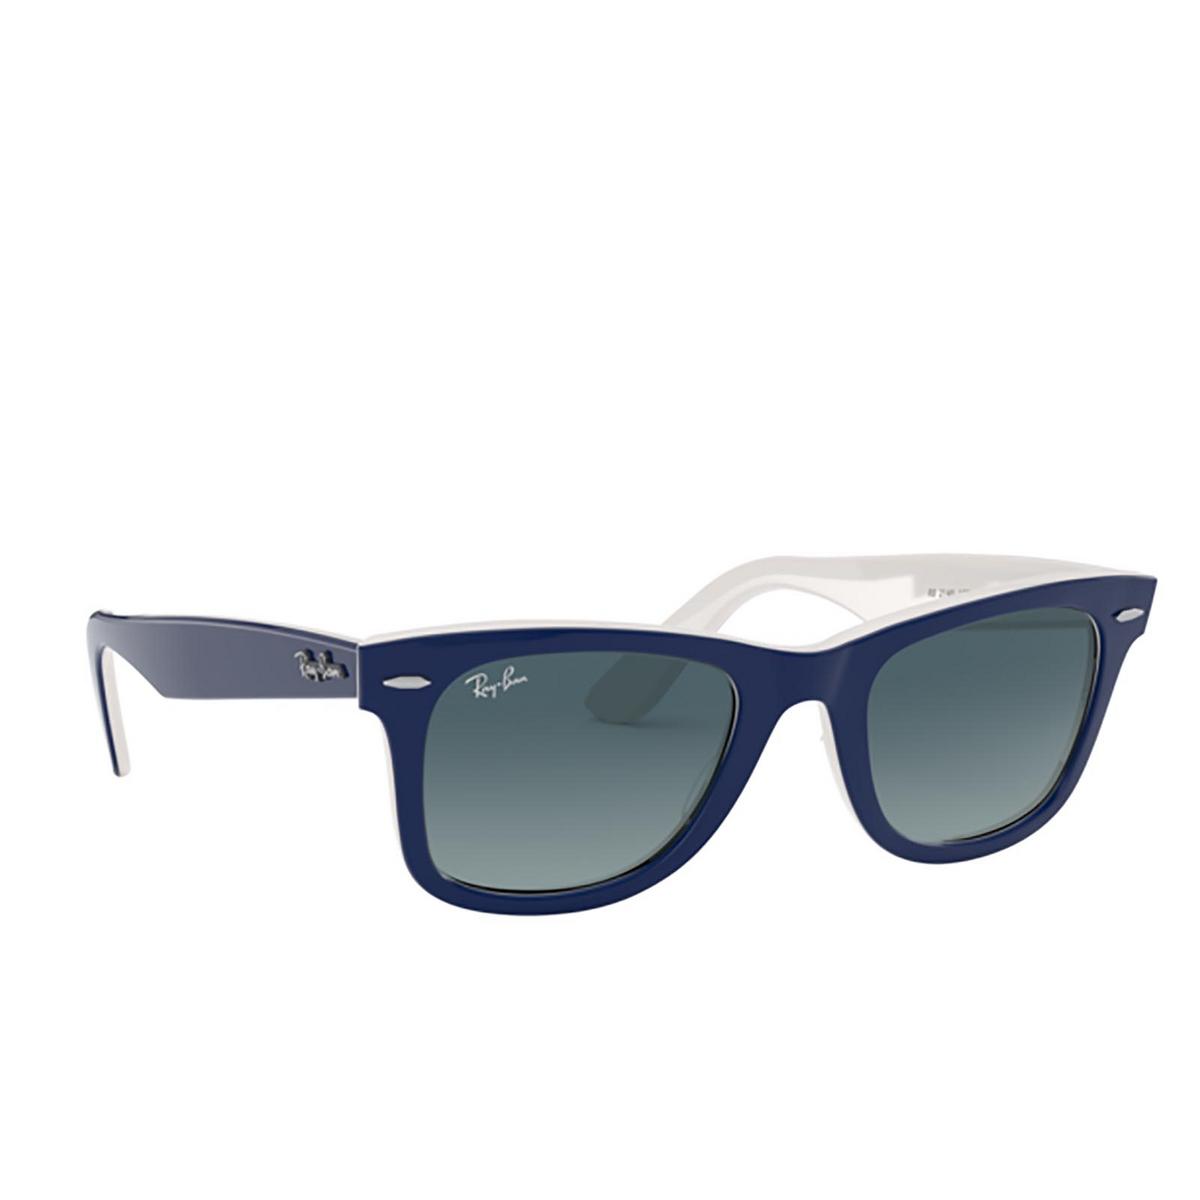 Ray-Ban® Square Sunglasses: Wayfarer RB2140 color Blue On White 12993M.